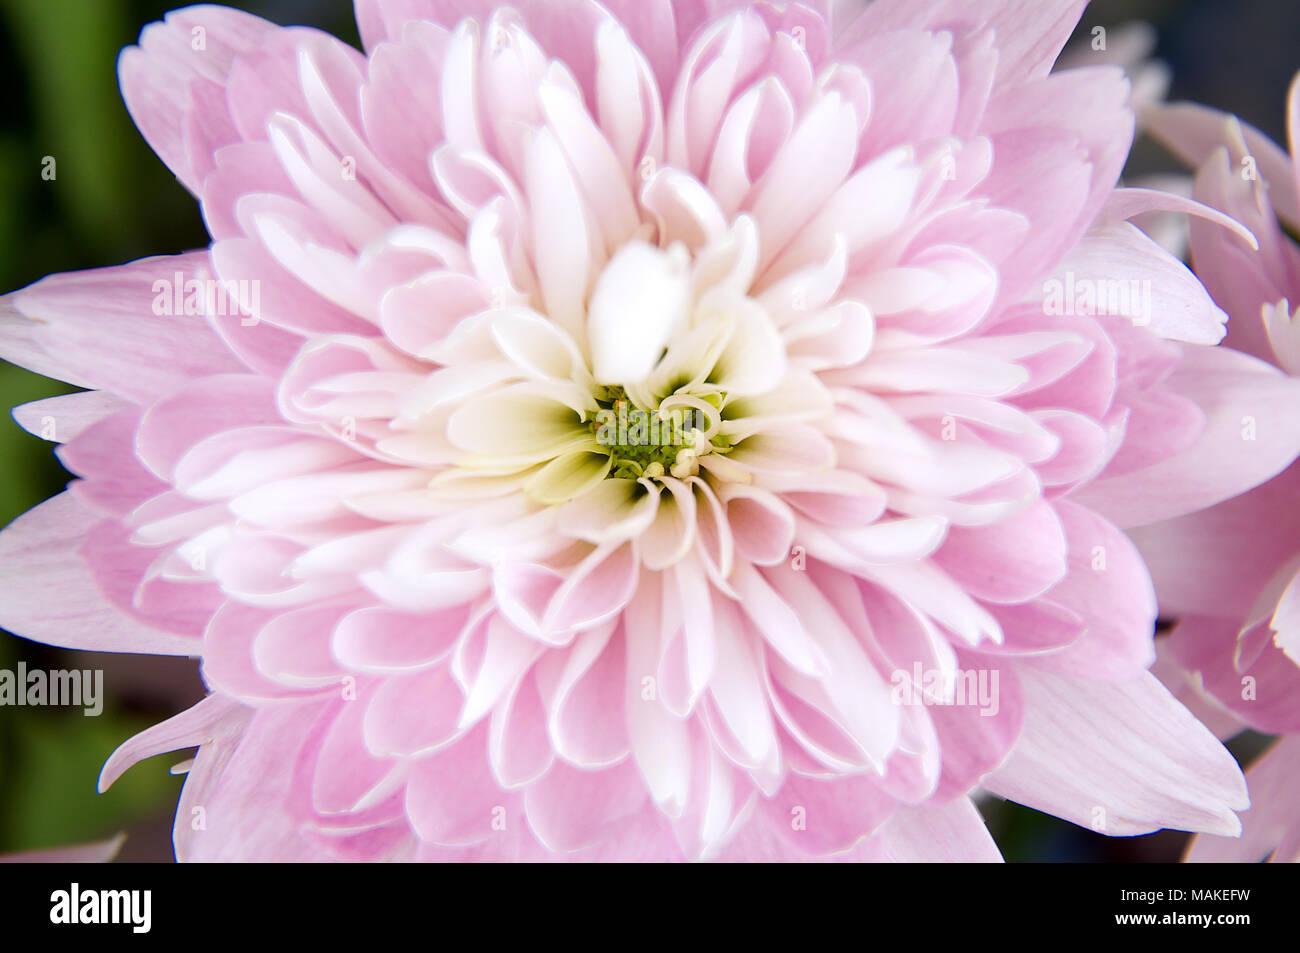 A top down view of a light pink dahlia flower stock photo 178678749 a top down view of a light pink dahlia flower izmirmasajfo